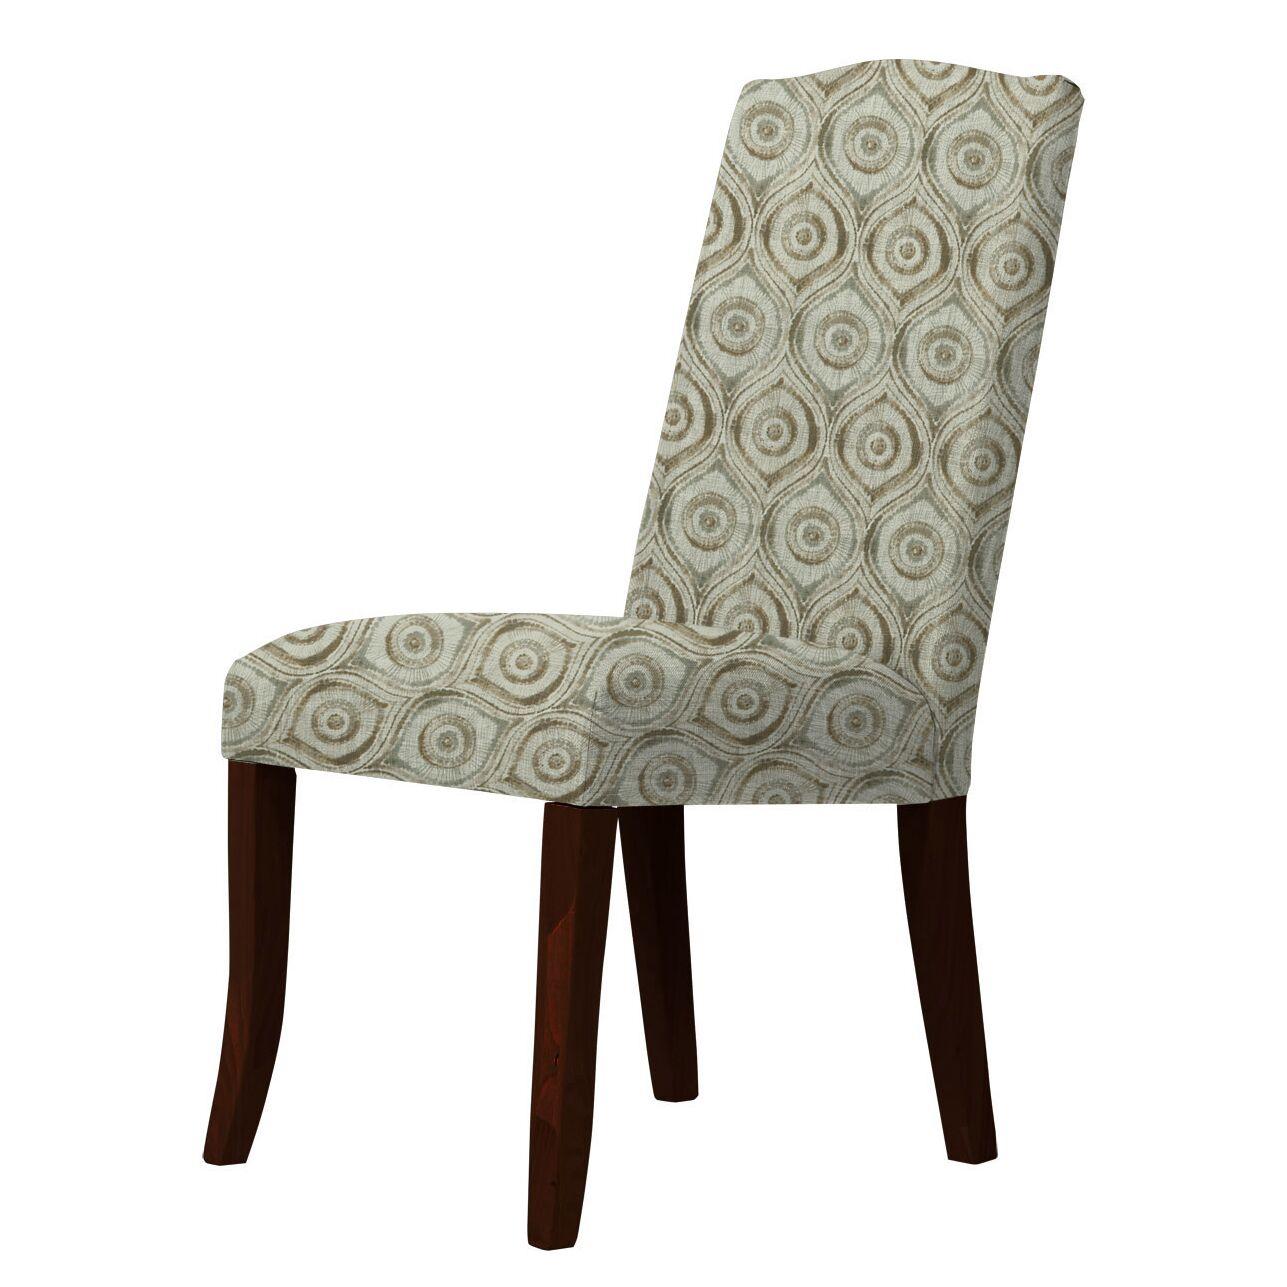 Lasseter Upholstered Dining Chair